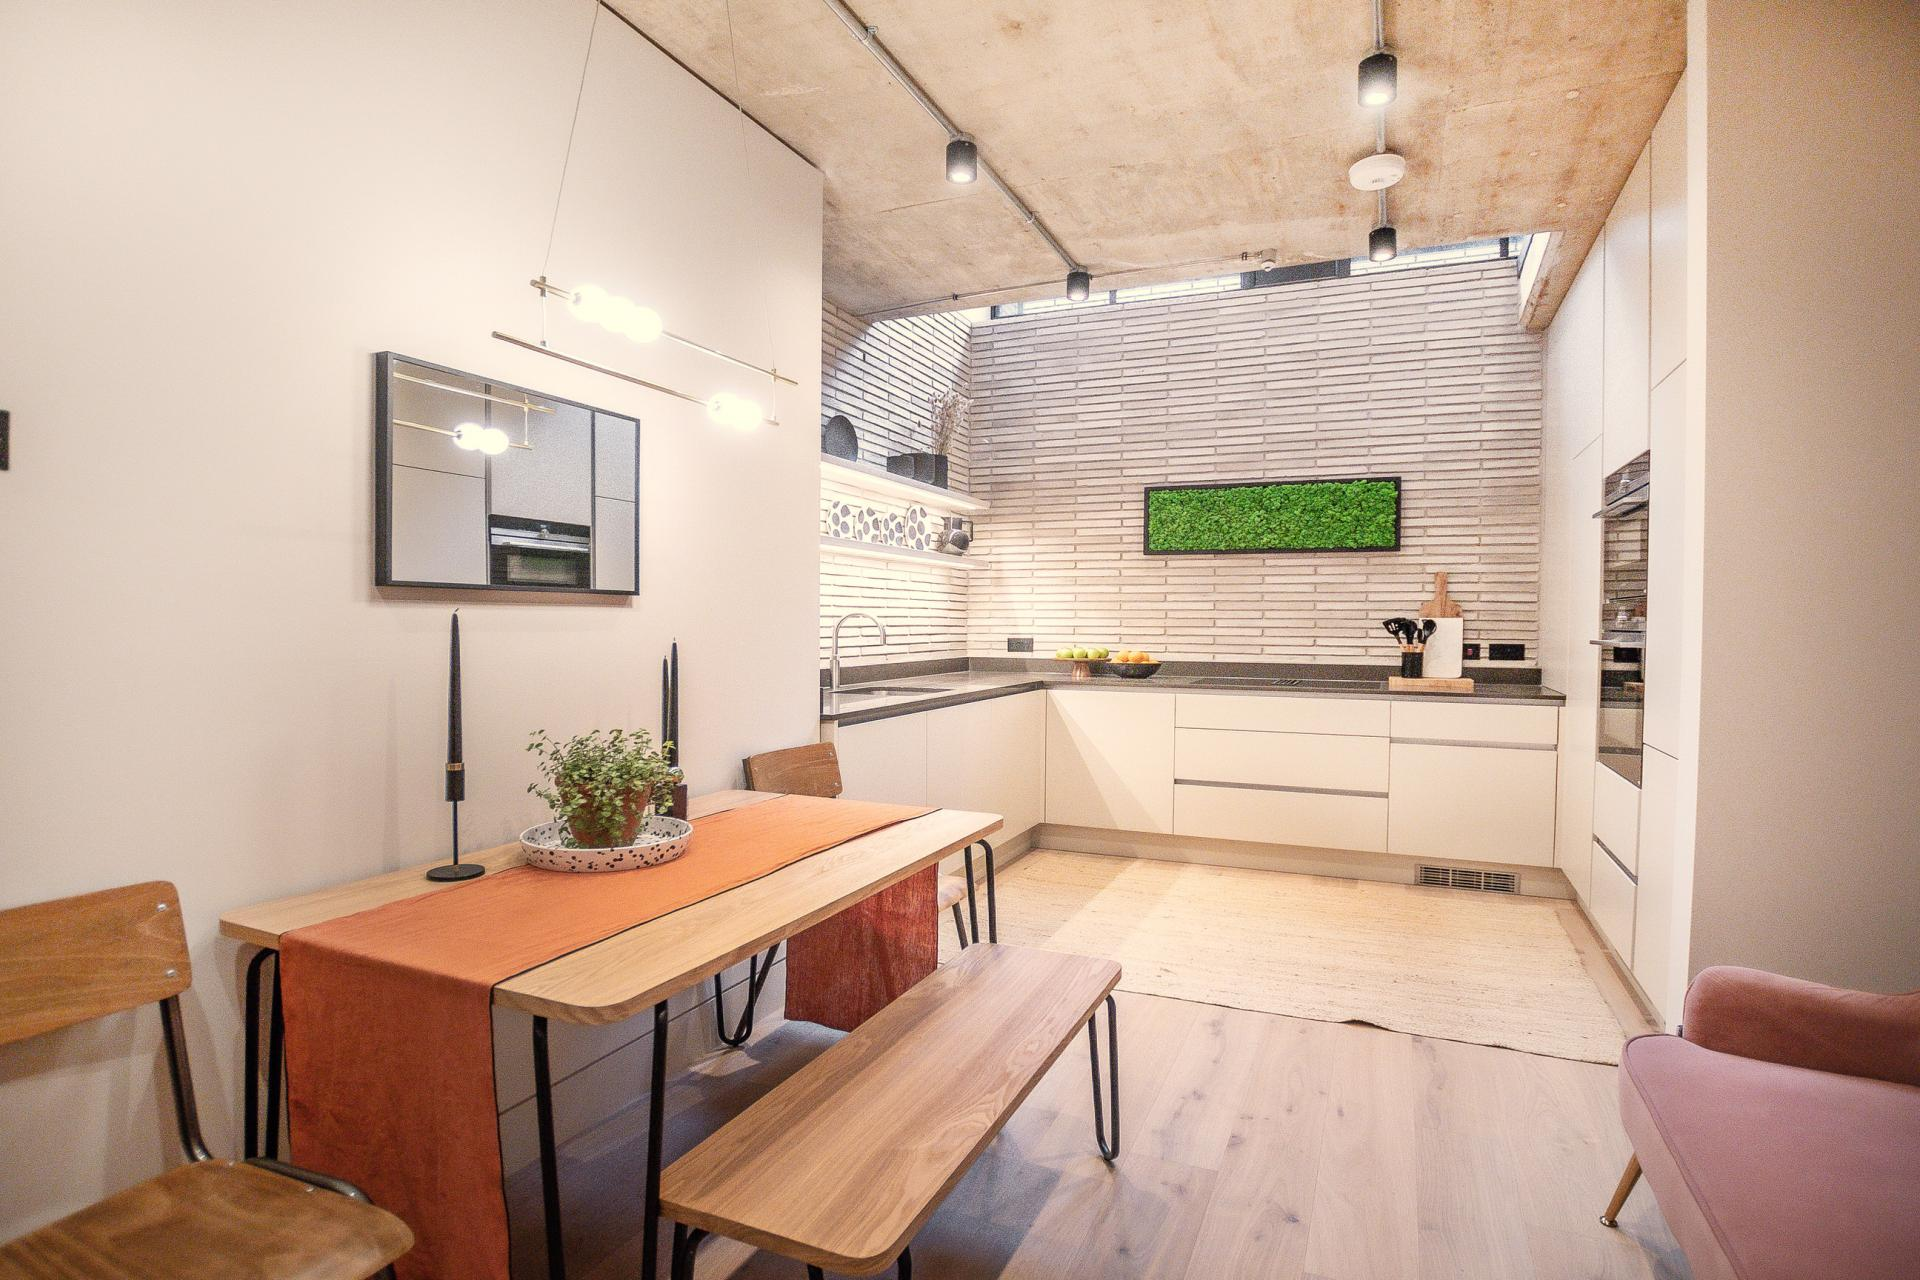 Kitchen diner at King's Mews Apartments, Holborn, London - Citybase Apartments